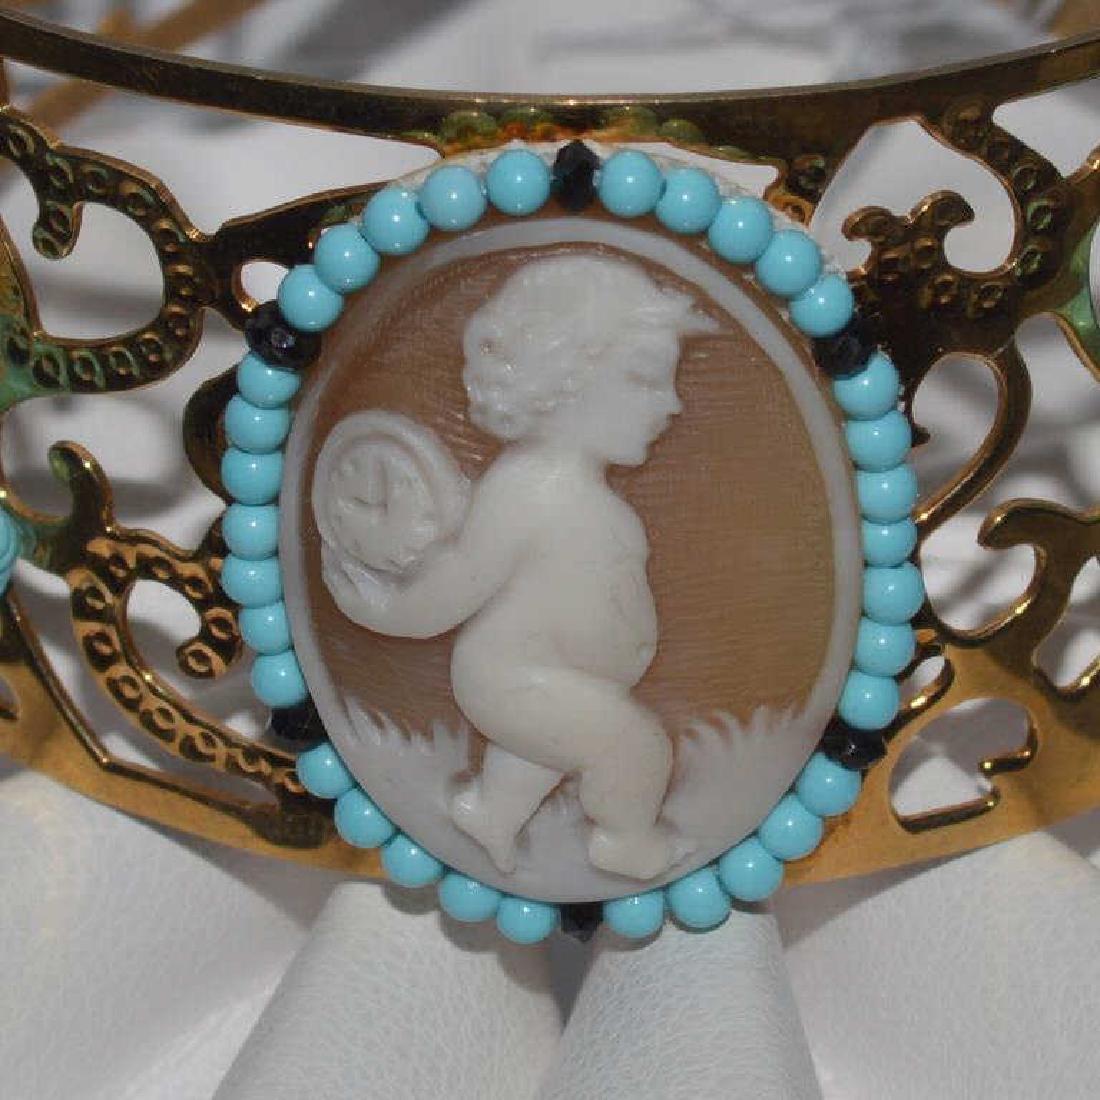 Cameo cuff bracelet by Carada - 2